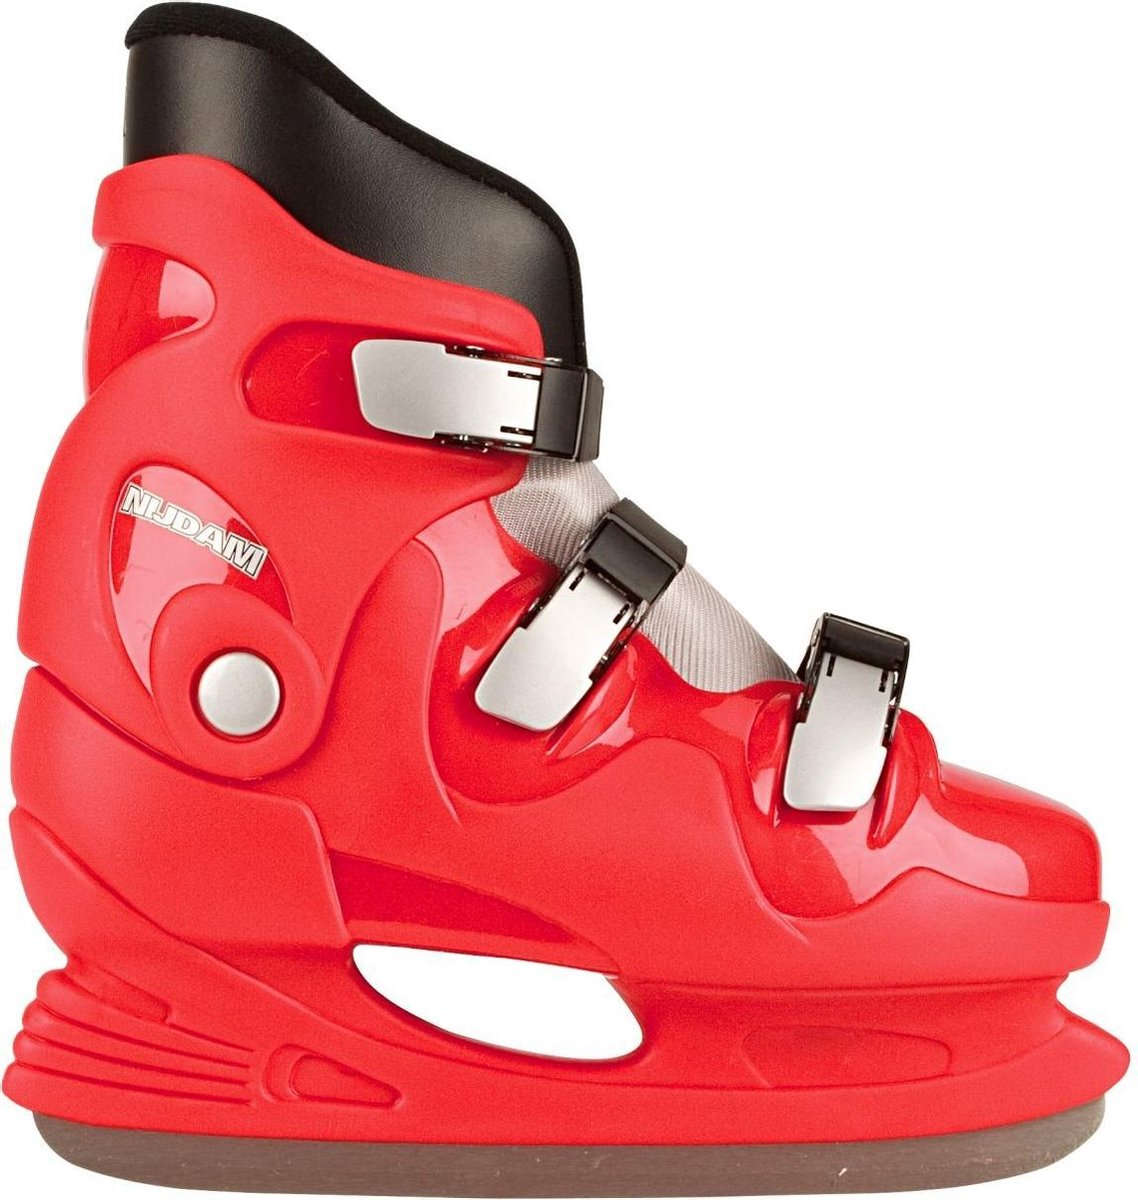 Nijdam Kids Hockey Skates - Schaatsen - Kinder - Unisex - Rood - EU 32/33